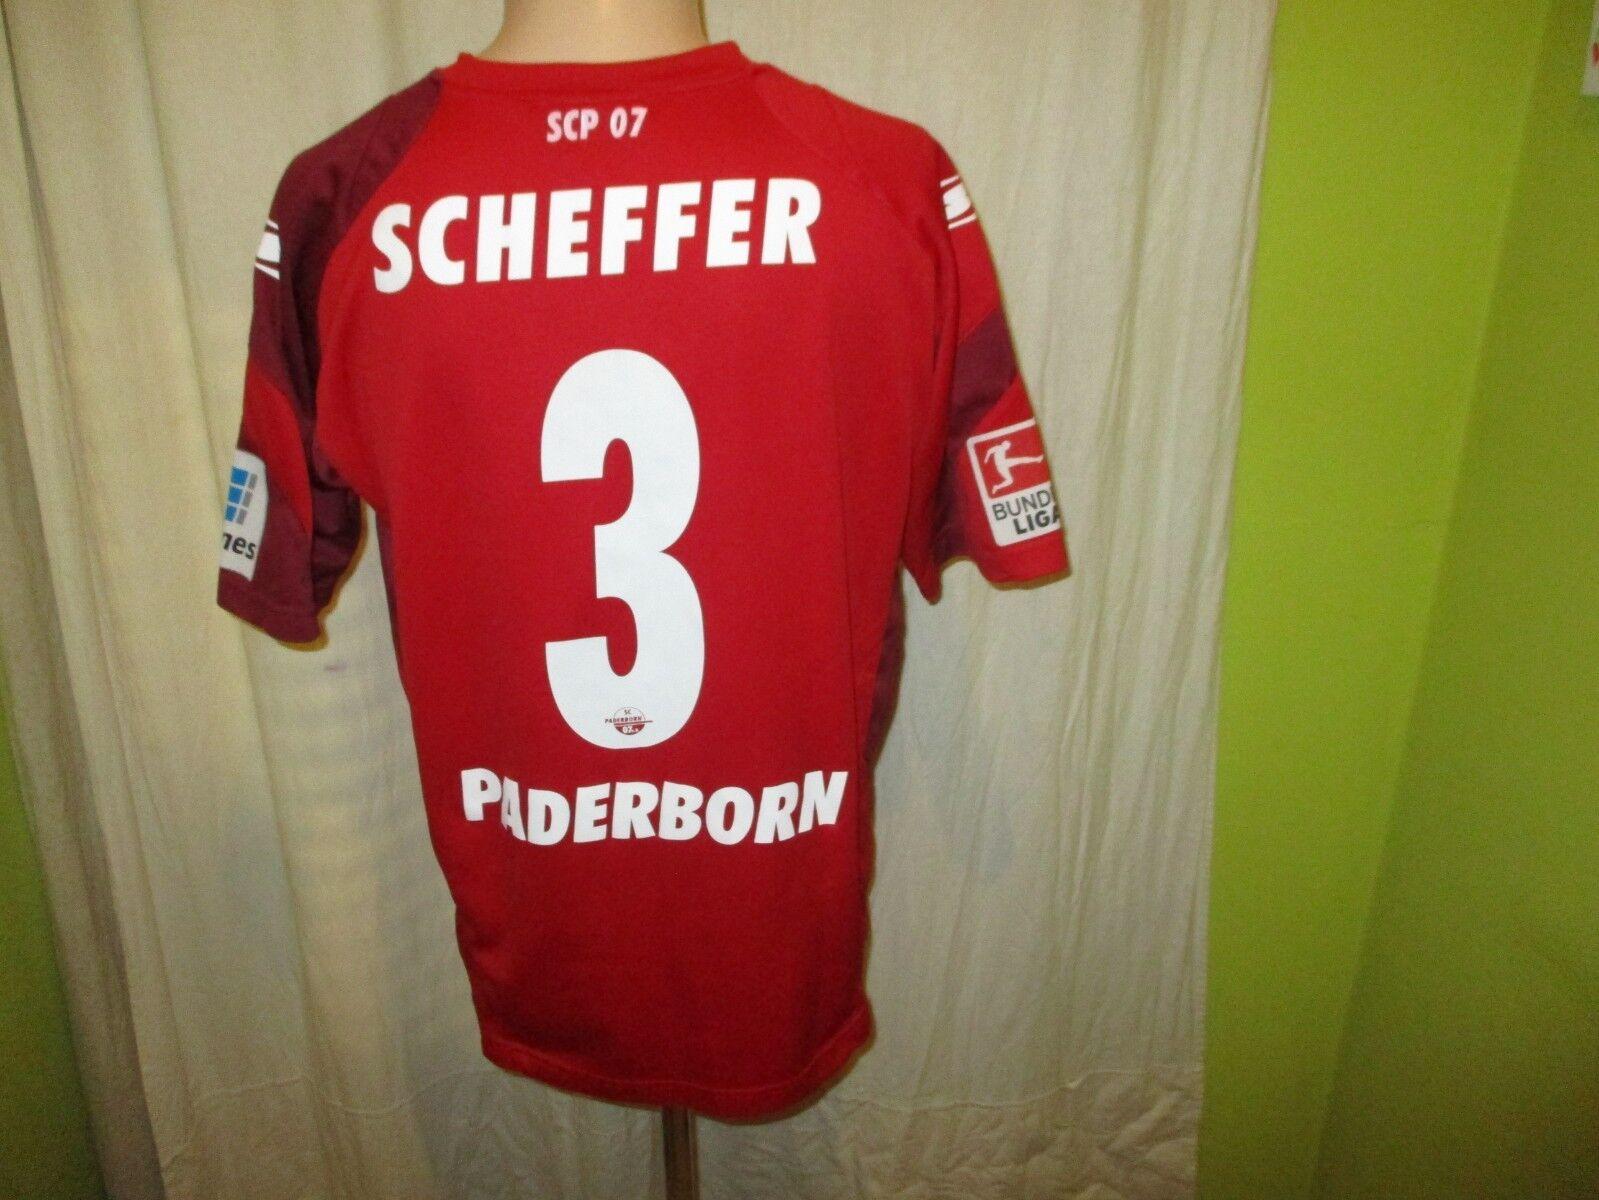 SC Paderborn saller Auswärts Trikot Matchworn Trikot Auswärts 2013/14 + Nr.3 Scheffer Gr.M TOP f08c29